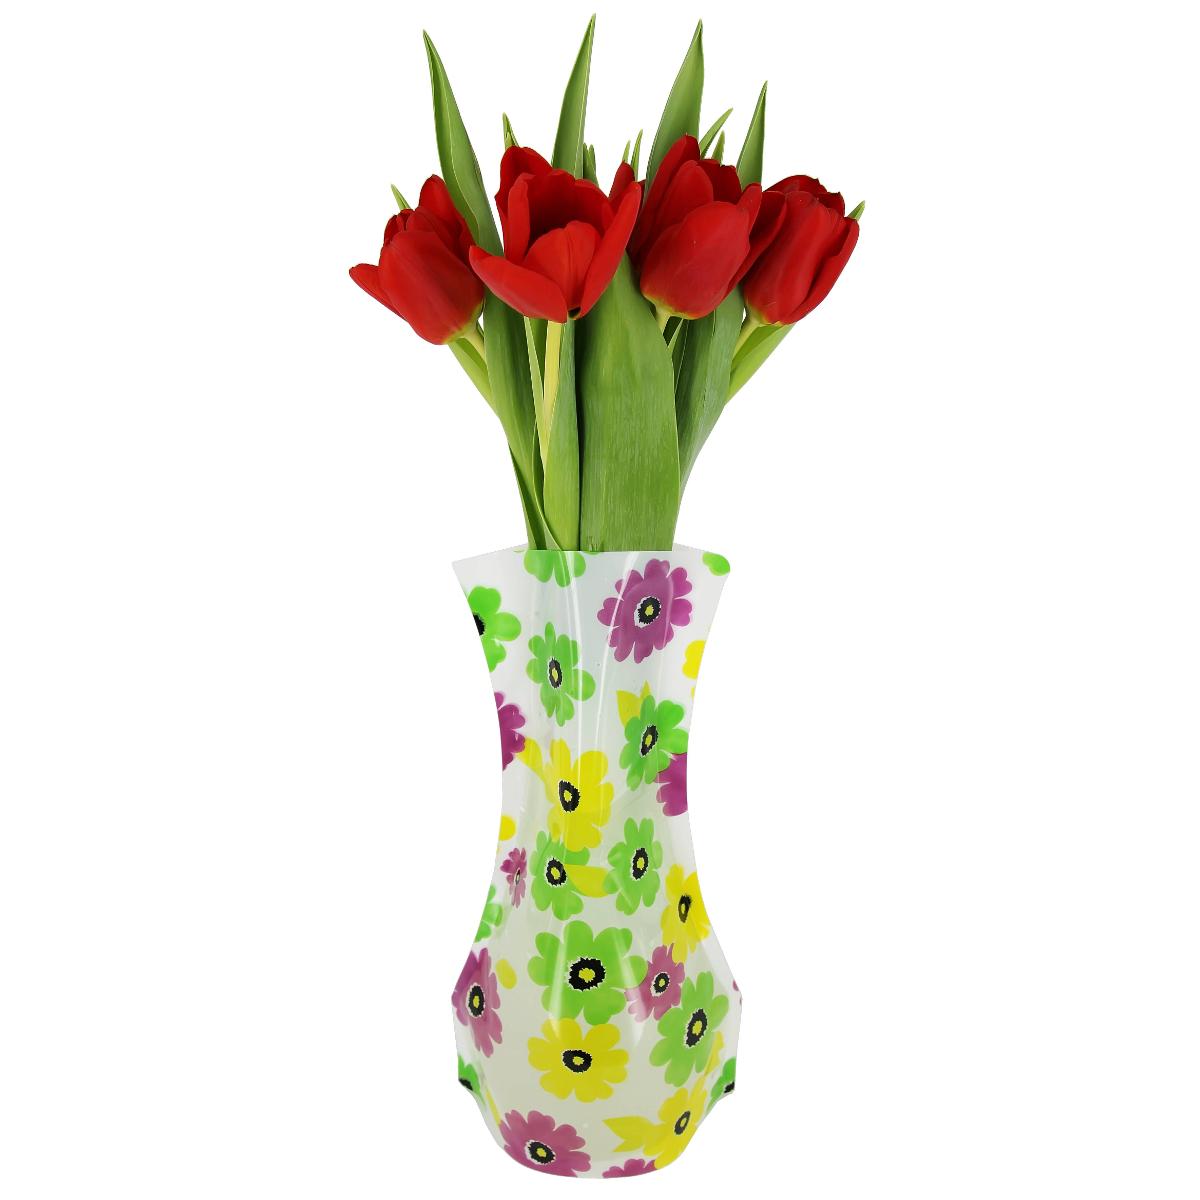 Ваза МастерПроф Желто-зеленые ромашки, пластичная, 1,2 л ваза мастерпроф черная орхидея пластичная 1 л